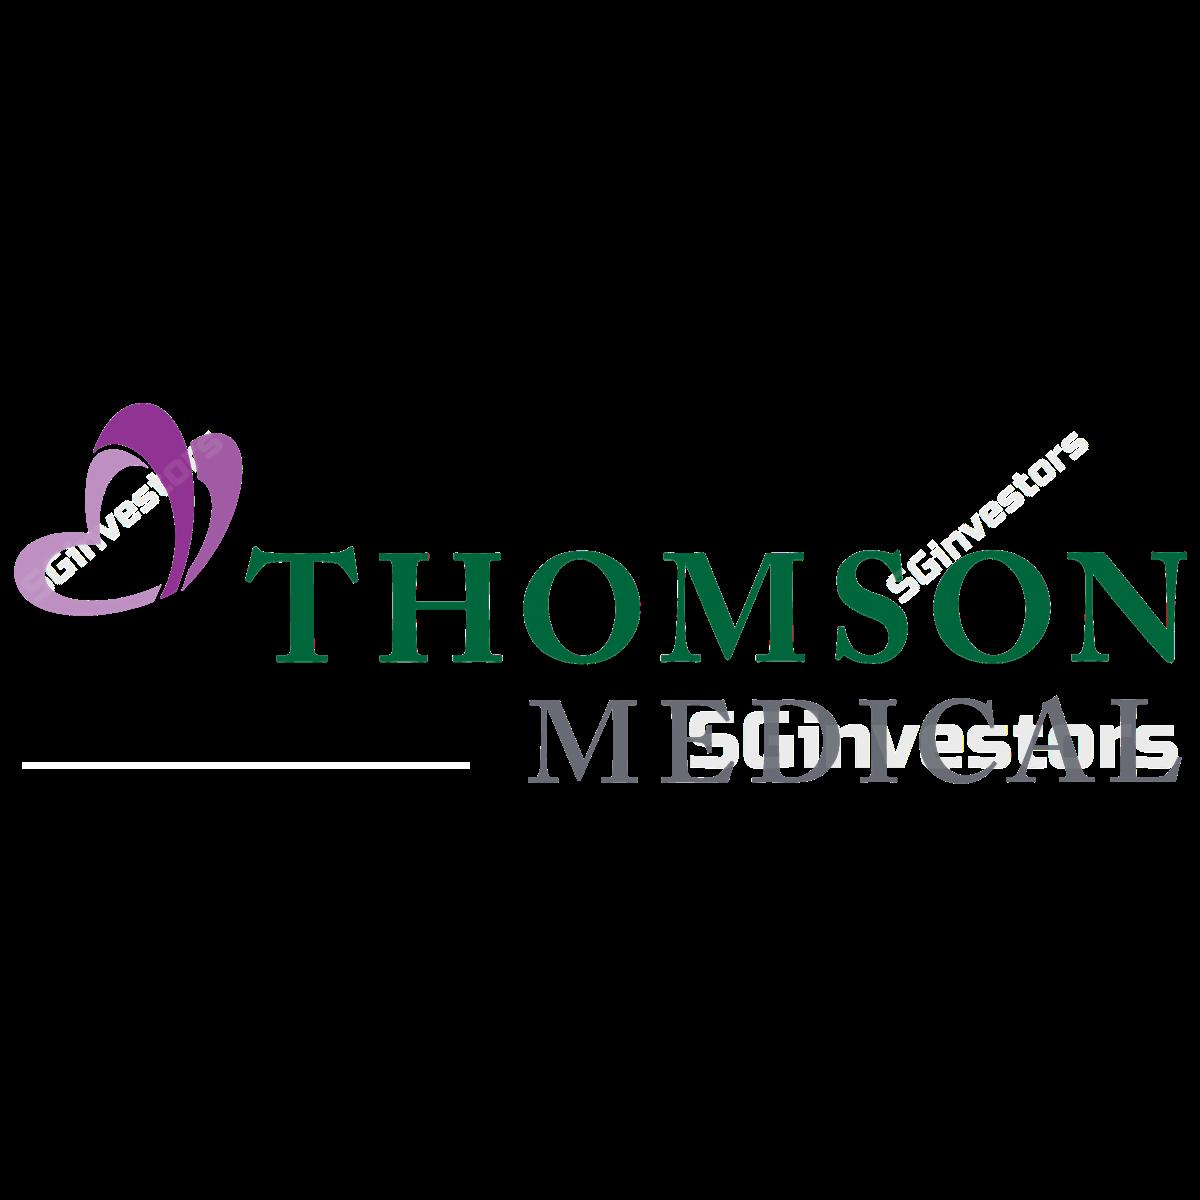 THOMSON MEDICAL GROUP LIMITED (SGX:A50) @ SGinvestors.io